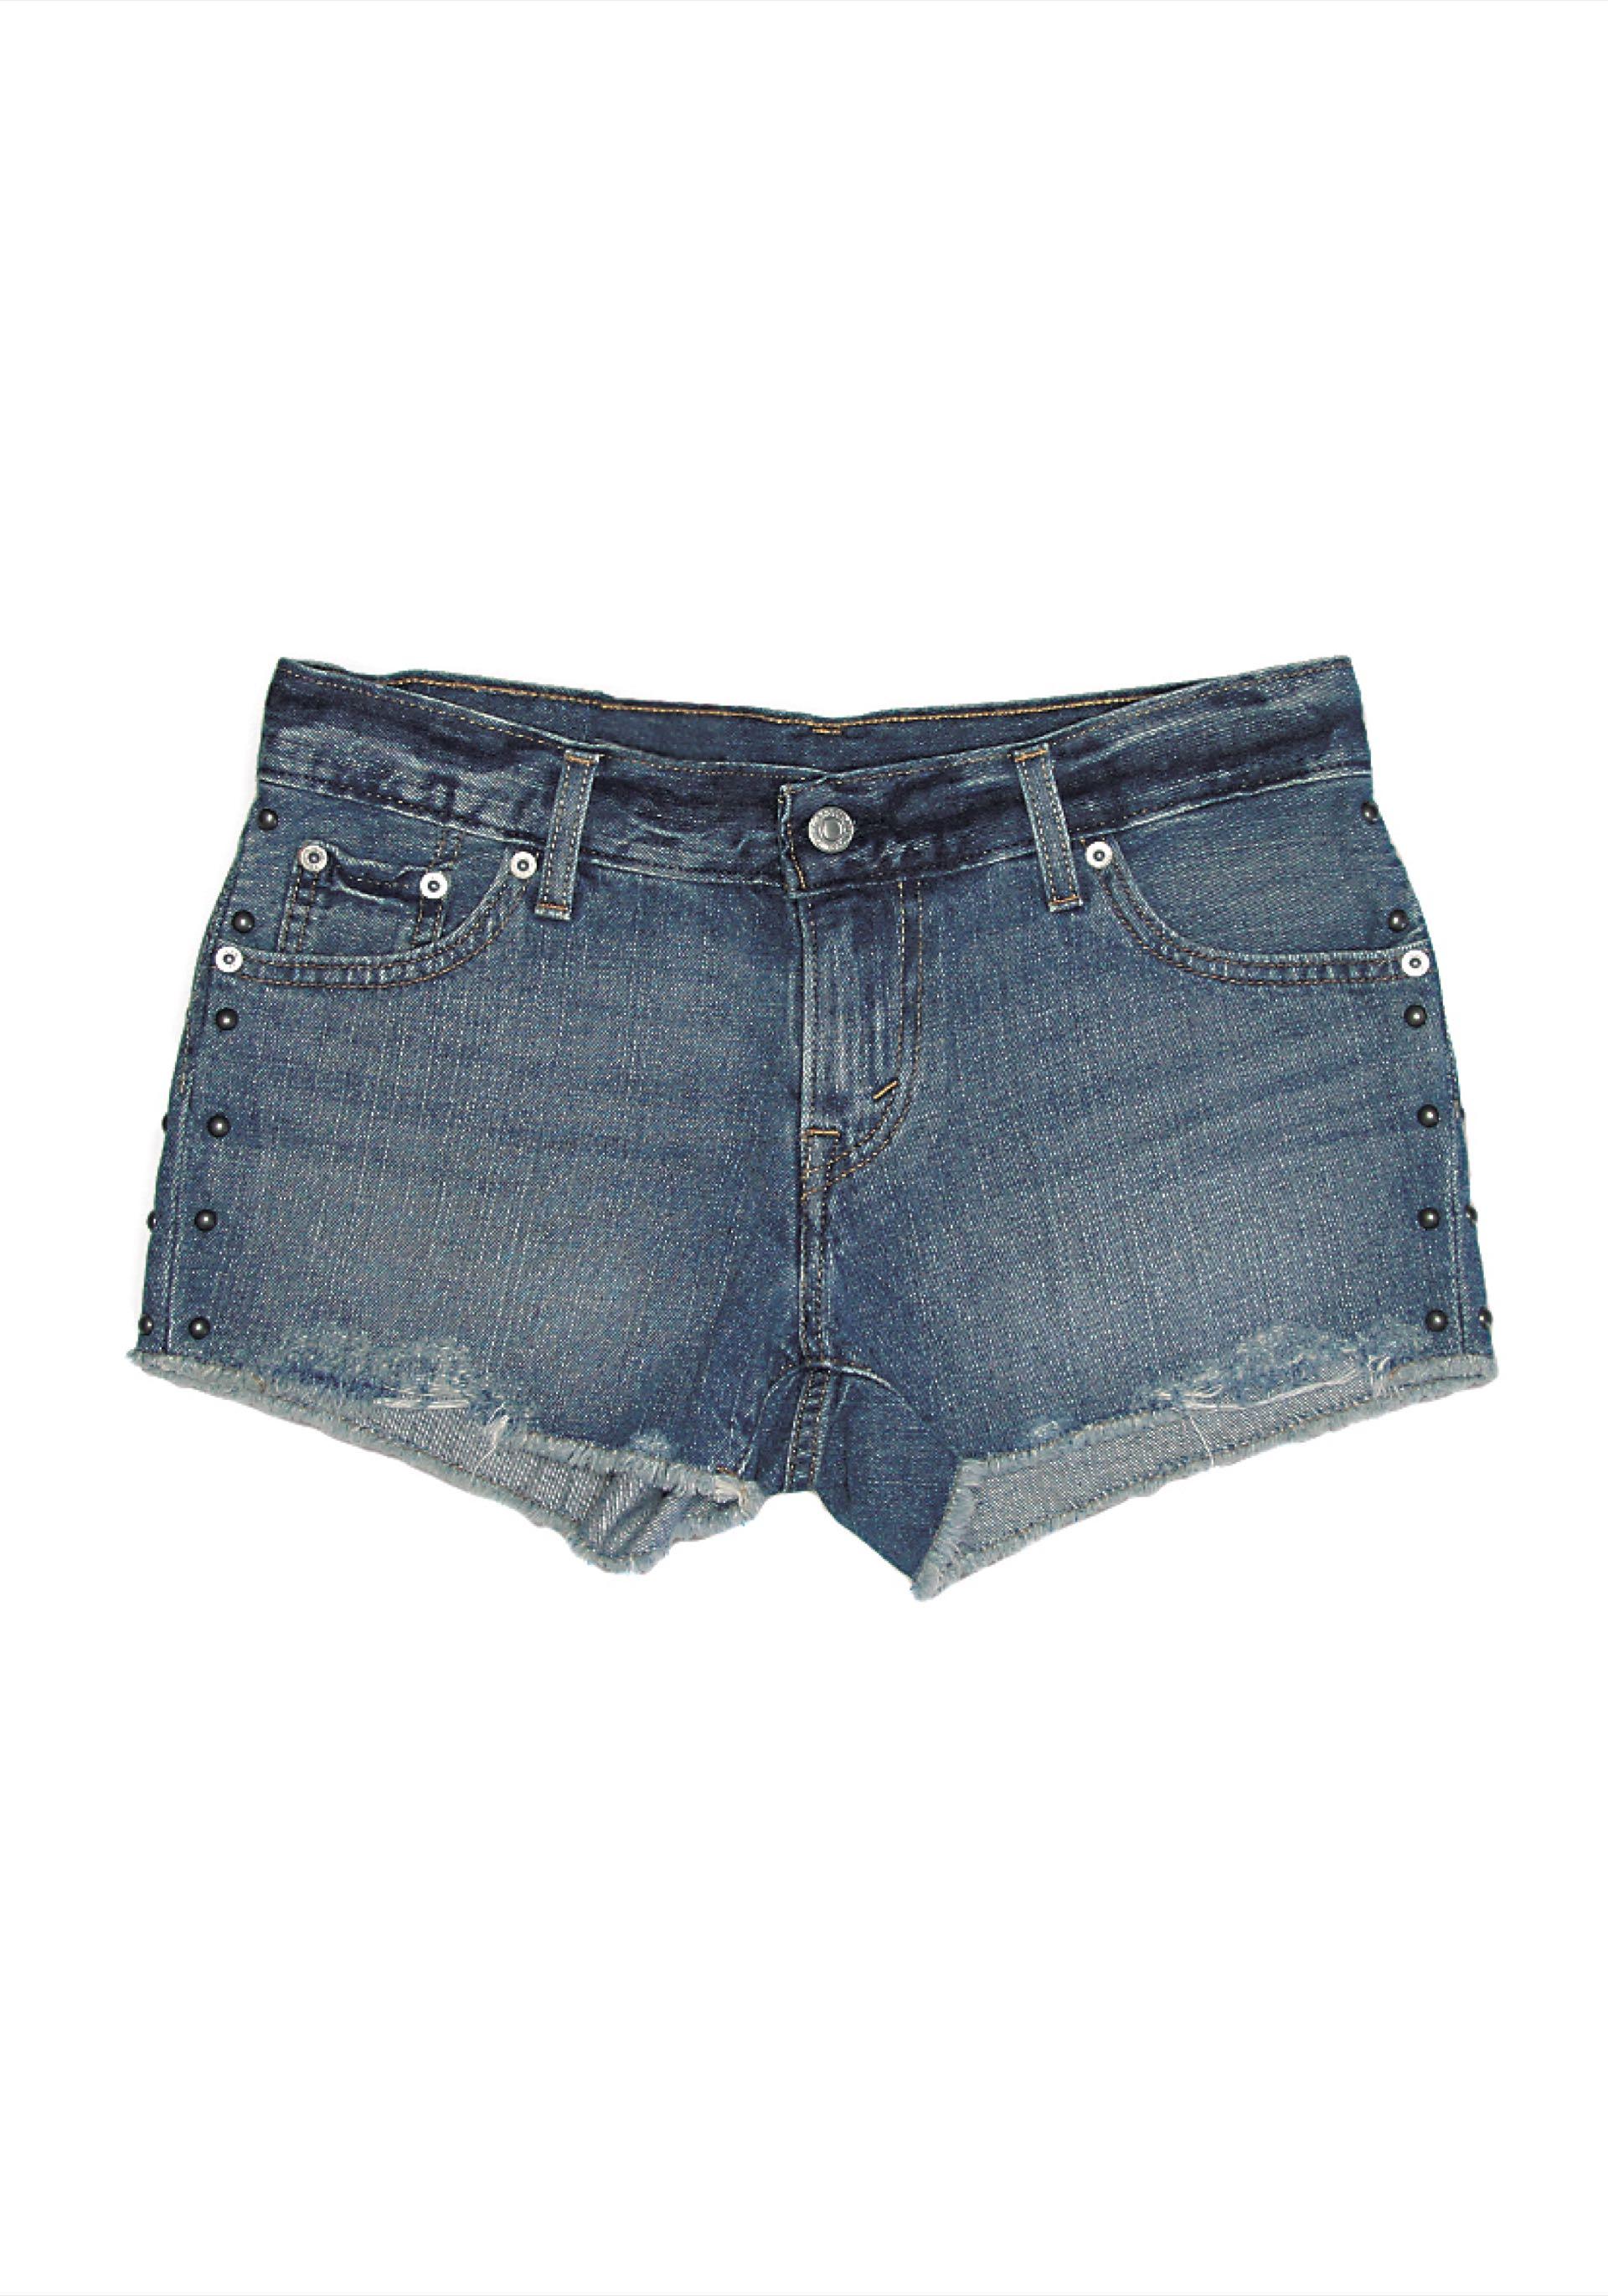 Short de jean con tachas($ 1.490, Levi's).